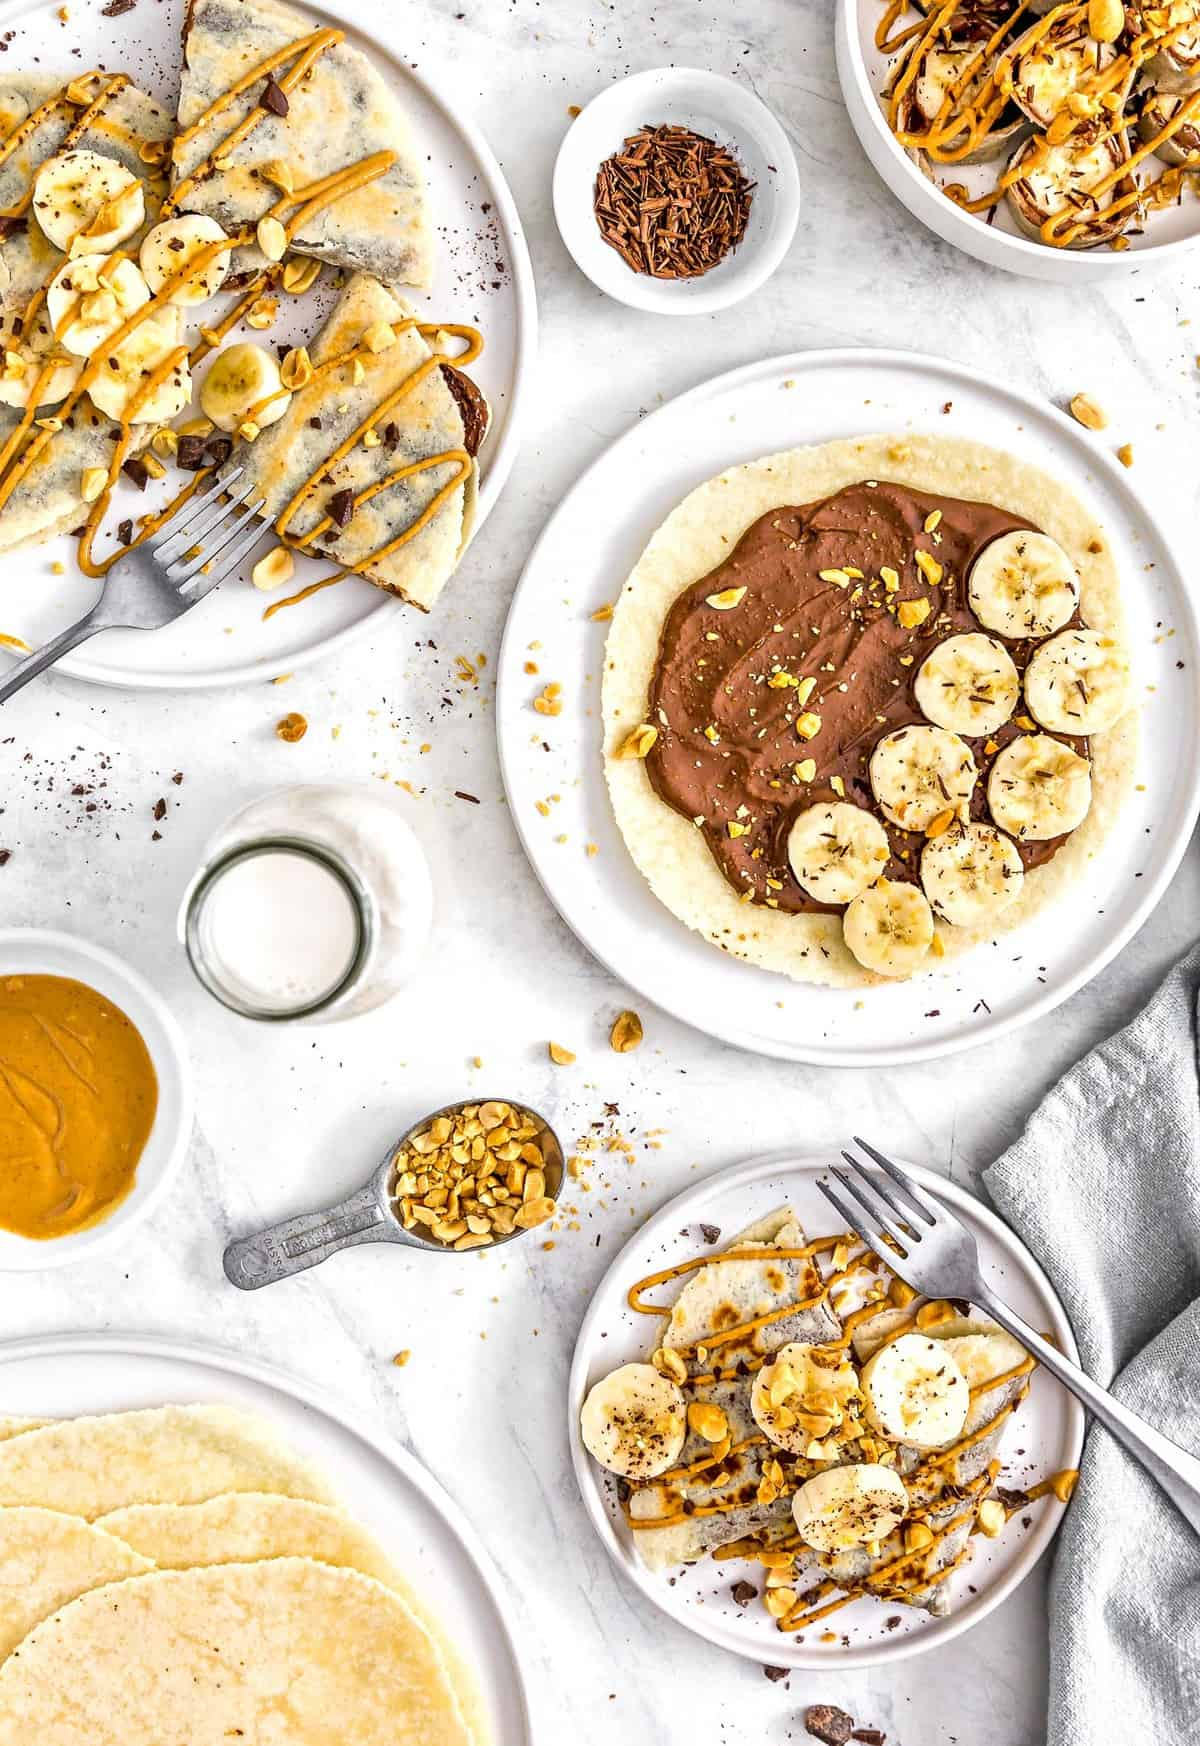 Chocolate Peanut Butter Banana Wrap, vegan wrap, vegan chocolate, vegan dessert, plant based, vegan, vegetarian, whole food plant based, gluten free, recipe, wfpb, healthy, healthy vegan, oil free, no refined sugar, no oil, refined sugar free, dairy free, chocolate, chocolate chips, peanut butter, banana, treats, sweets, desserts, fast recipe, easy recipe